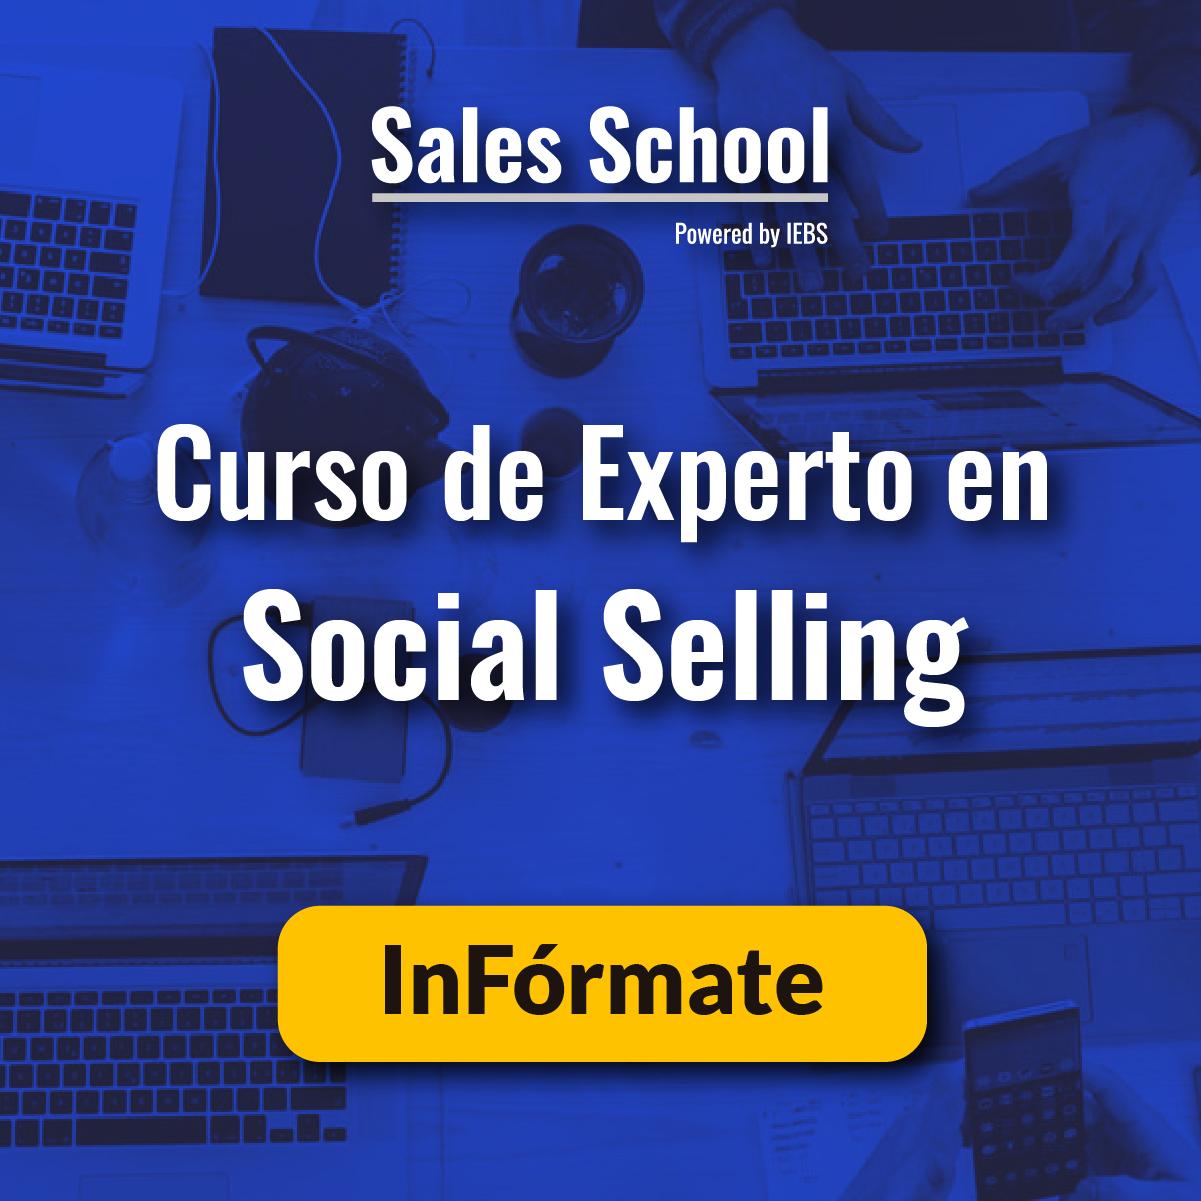 Sales School